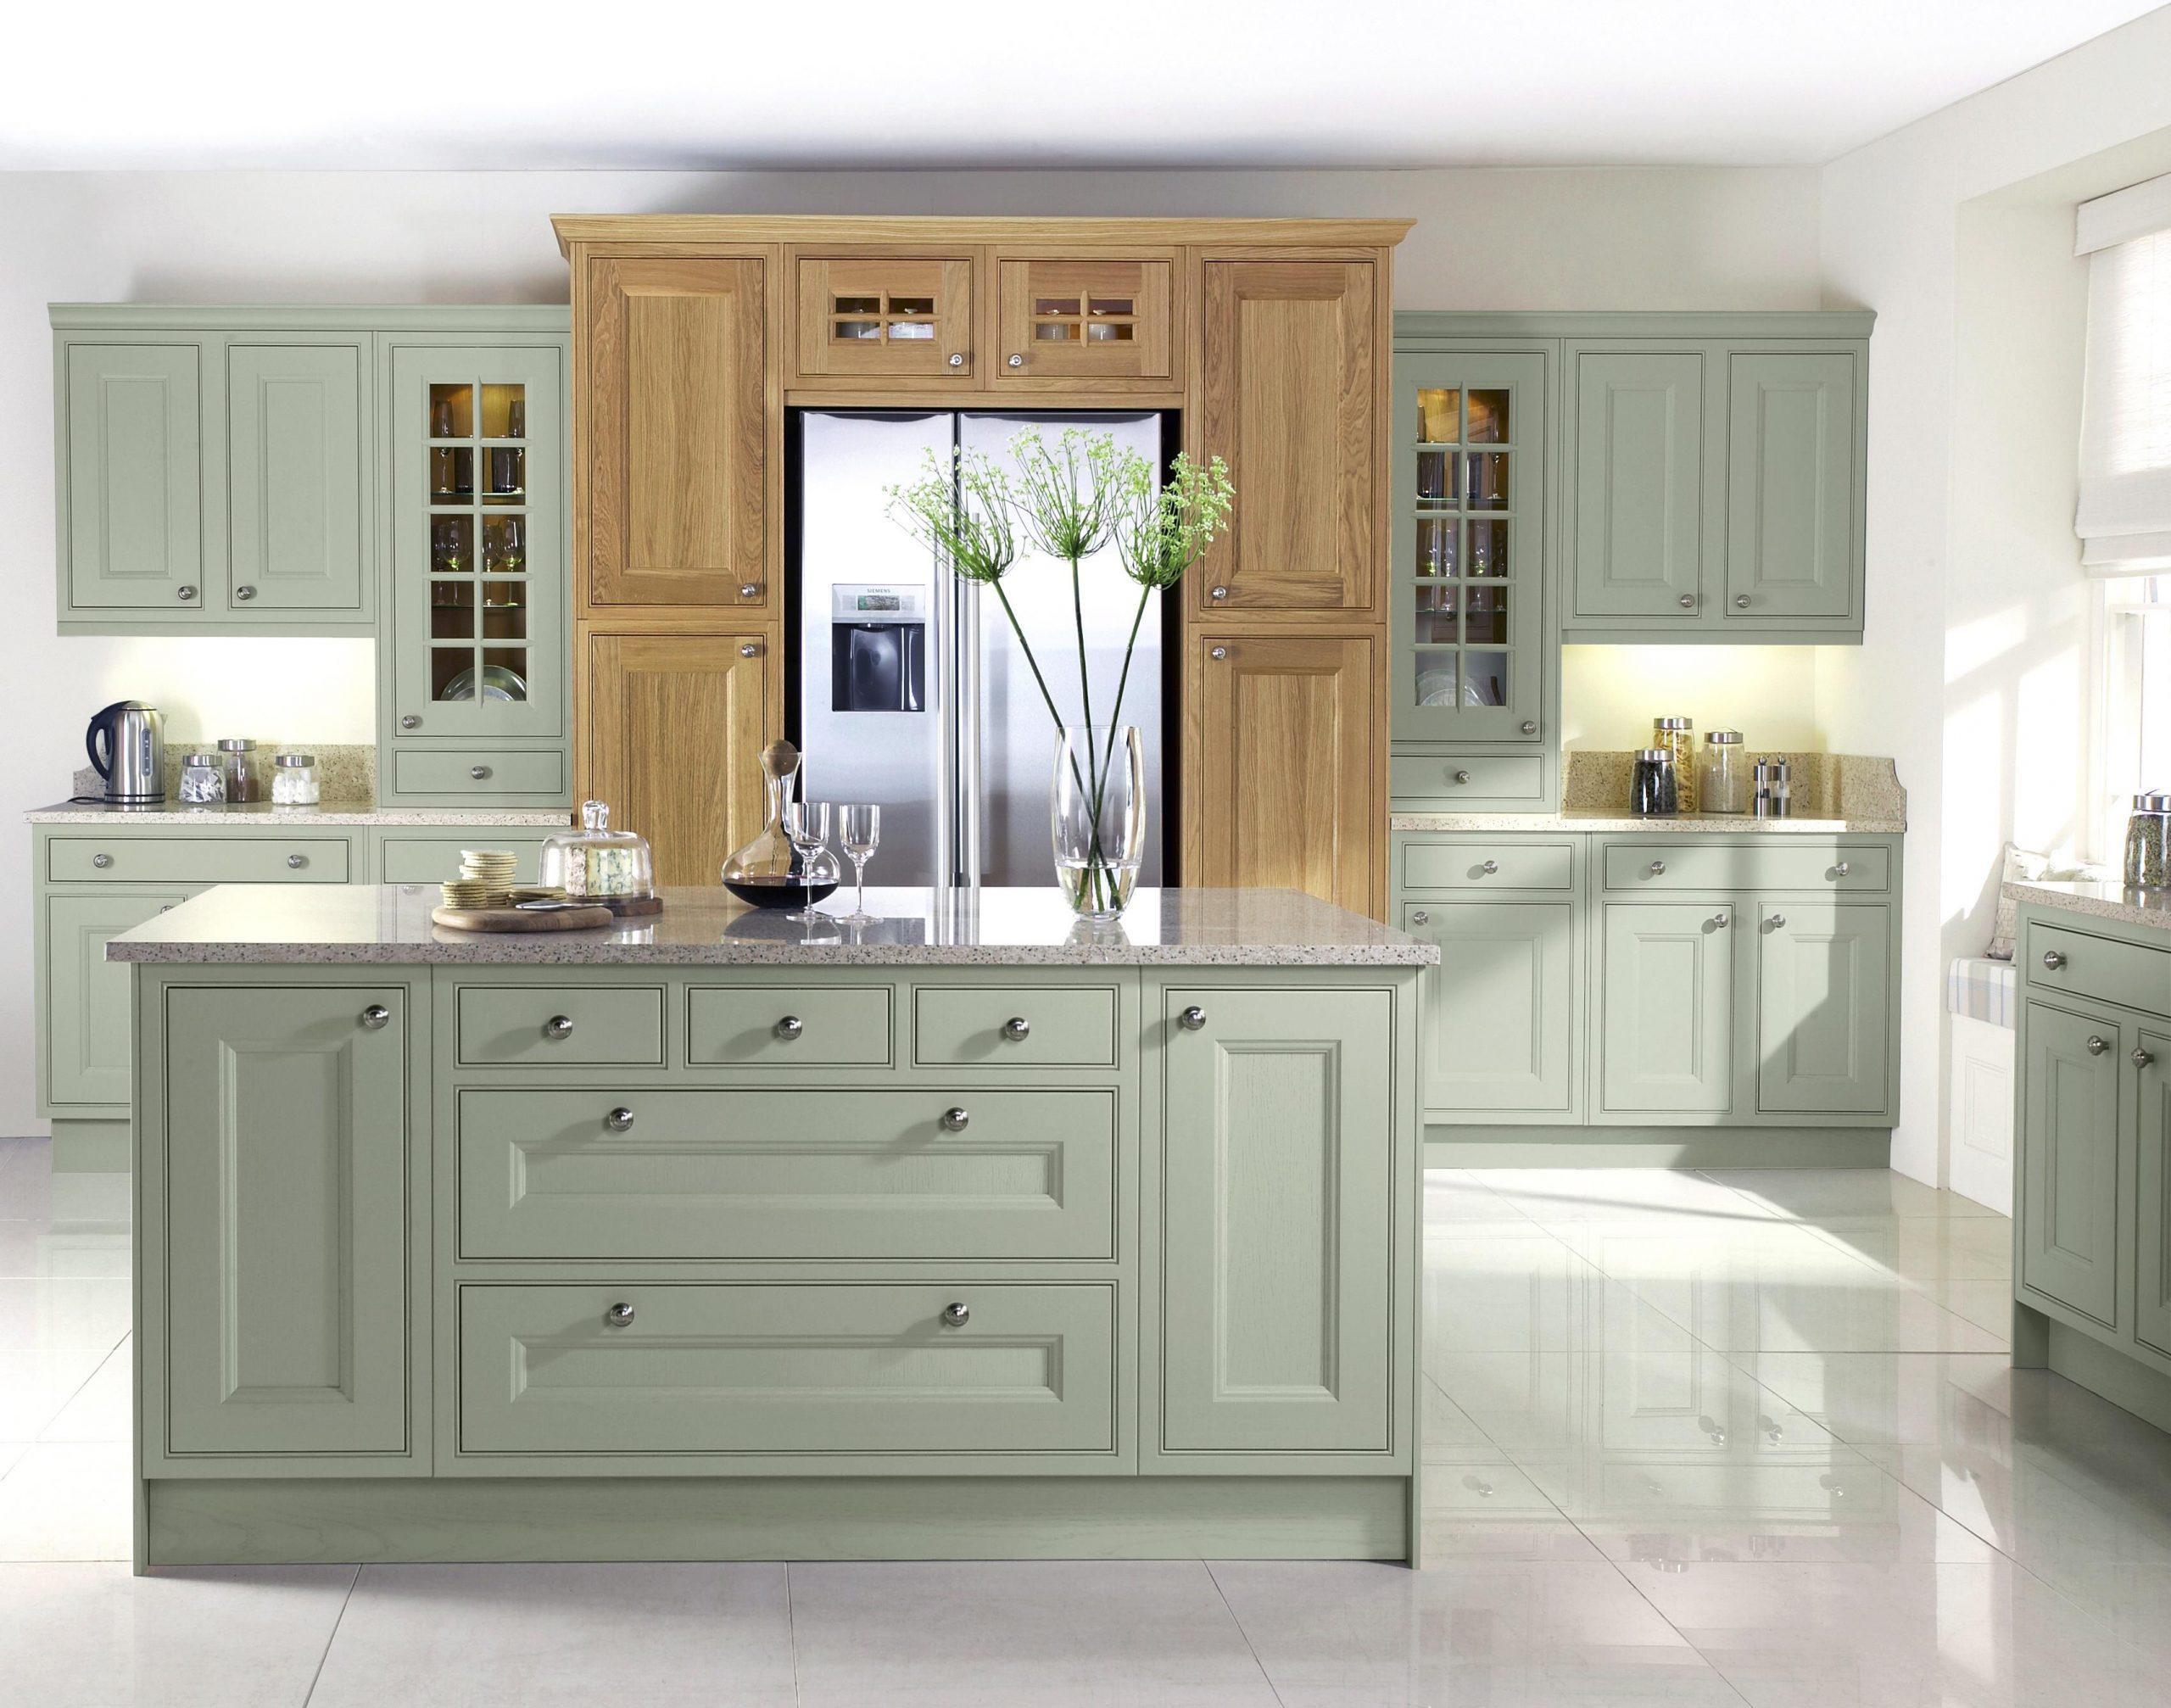 Tetbury Soft Moss kitchen